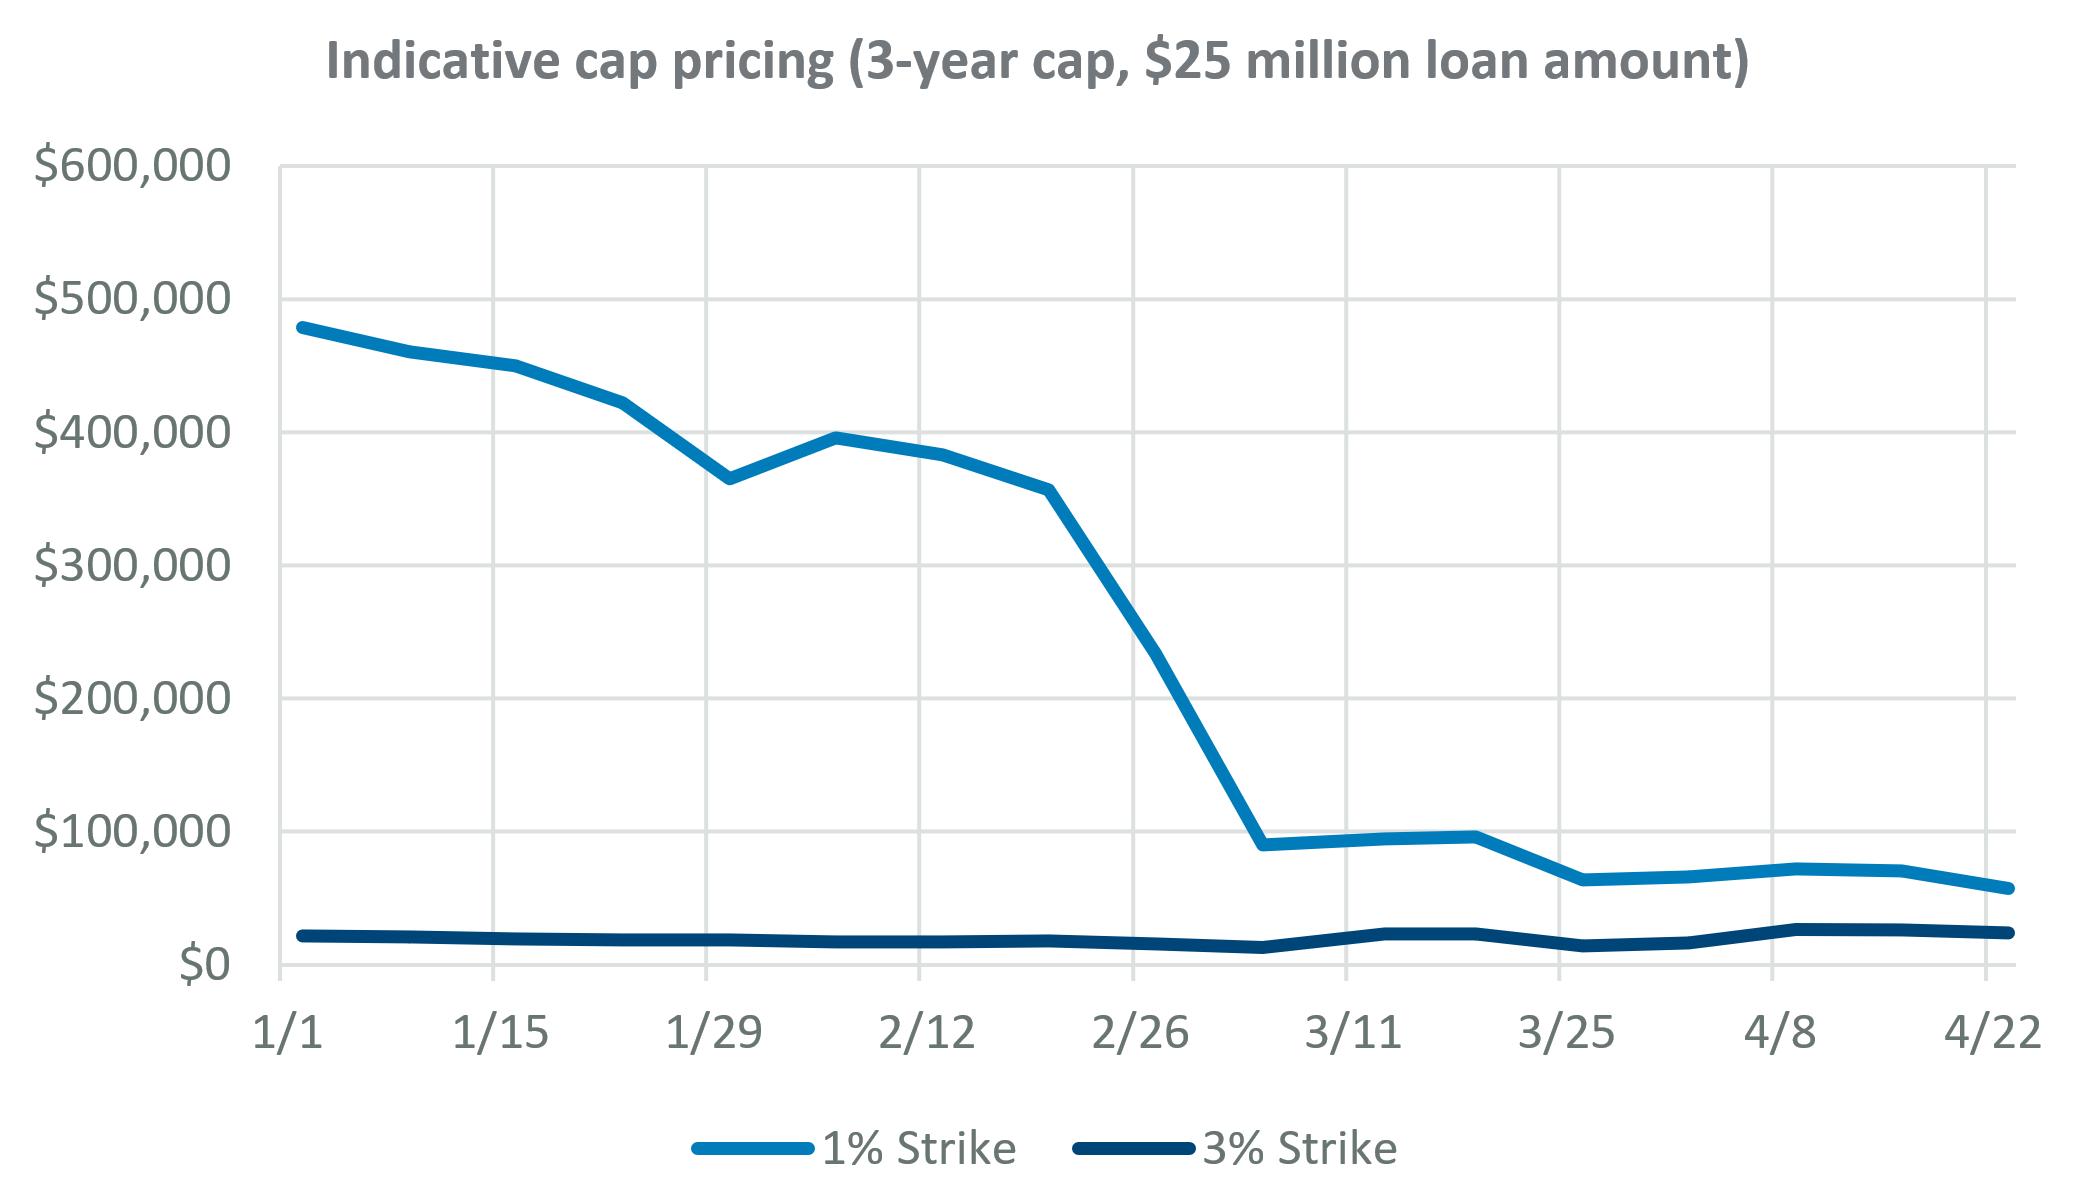 Indicative cap pricing